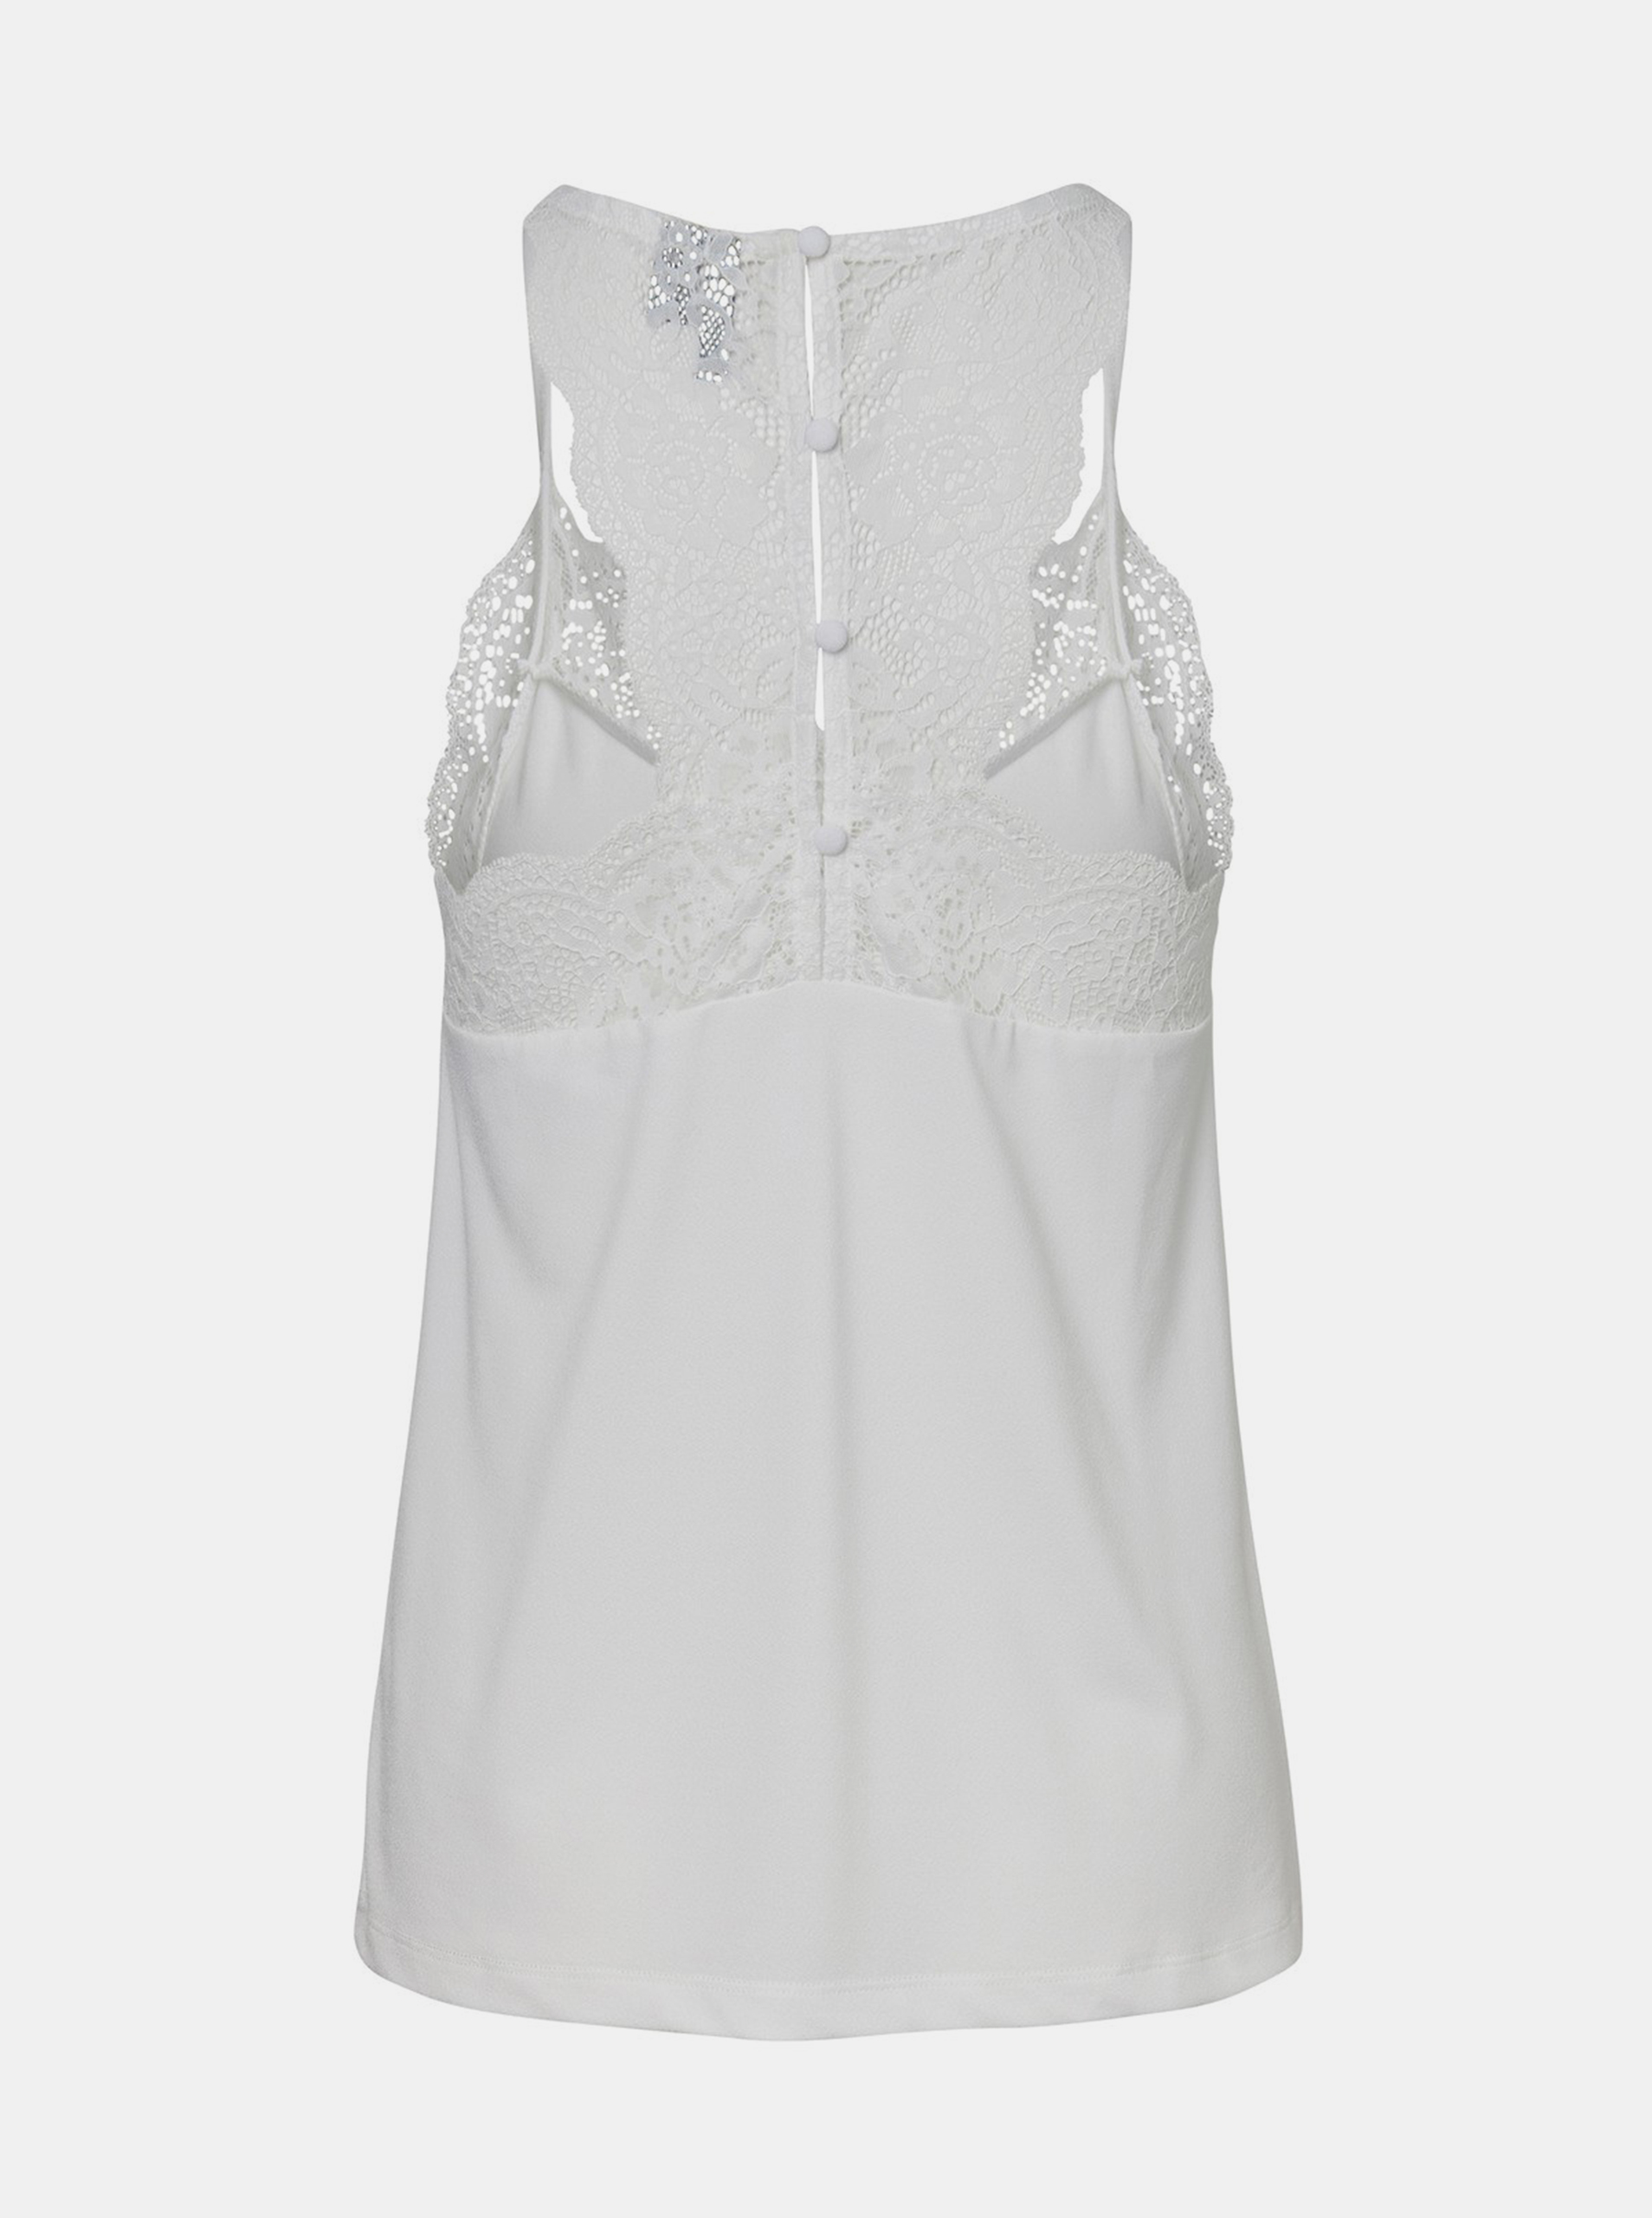 Vero Moda white top Ana